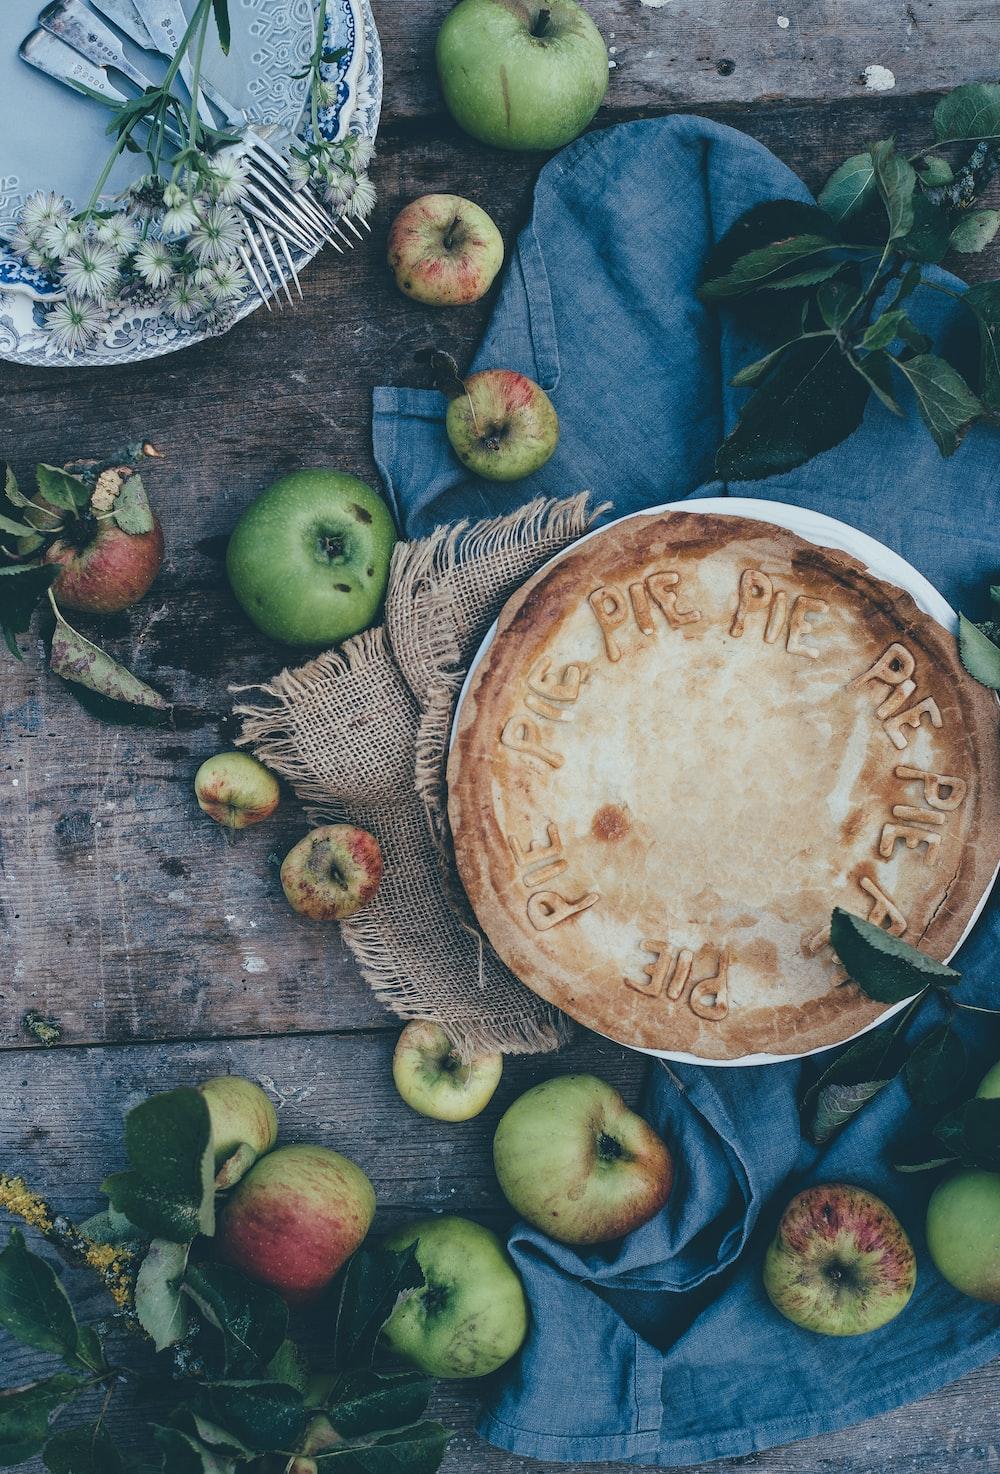 baked pie beside green apples